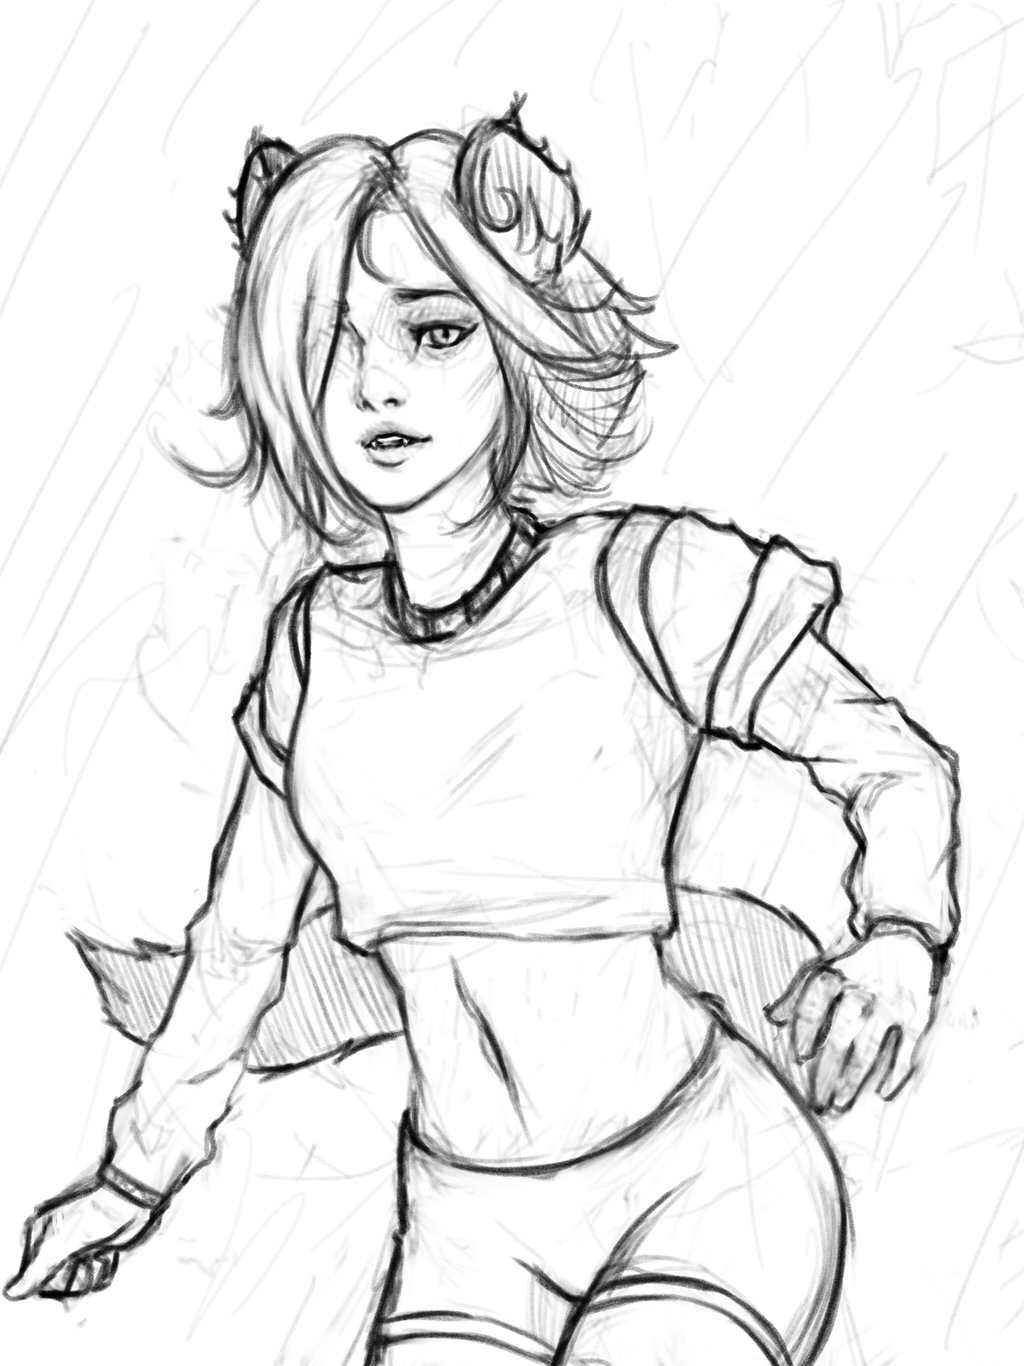 1024x1366 Sketching A Woodlandsy Hyena Girl By Whatneyesore